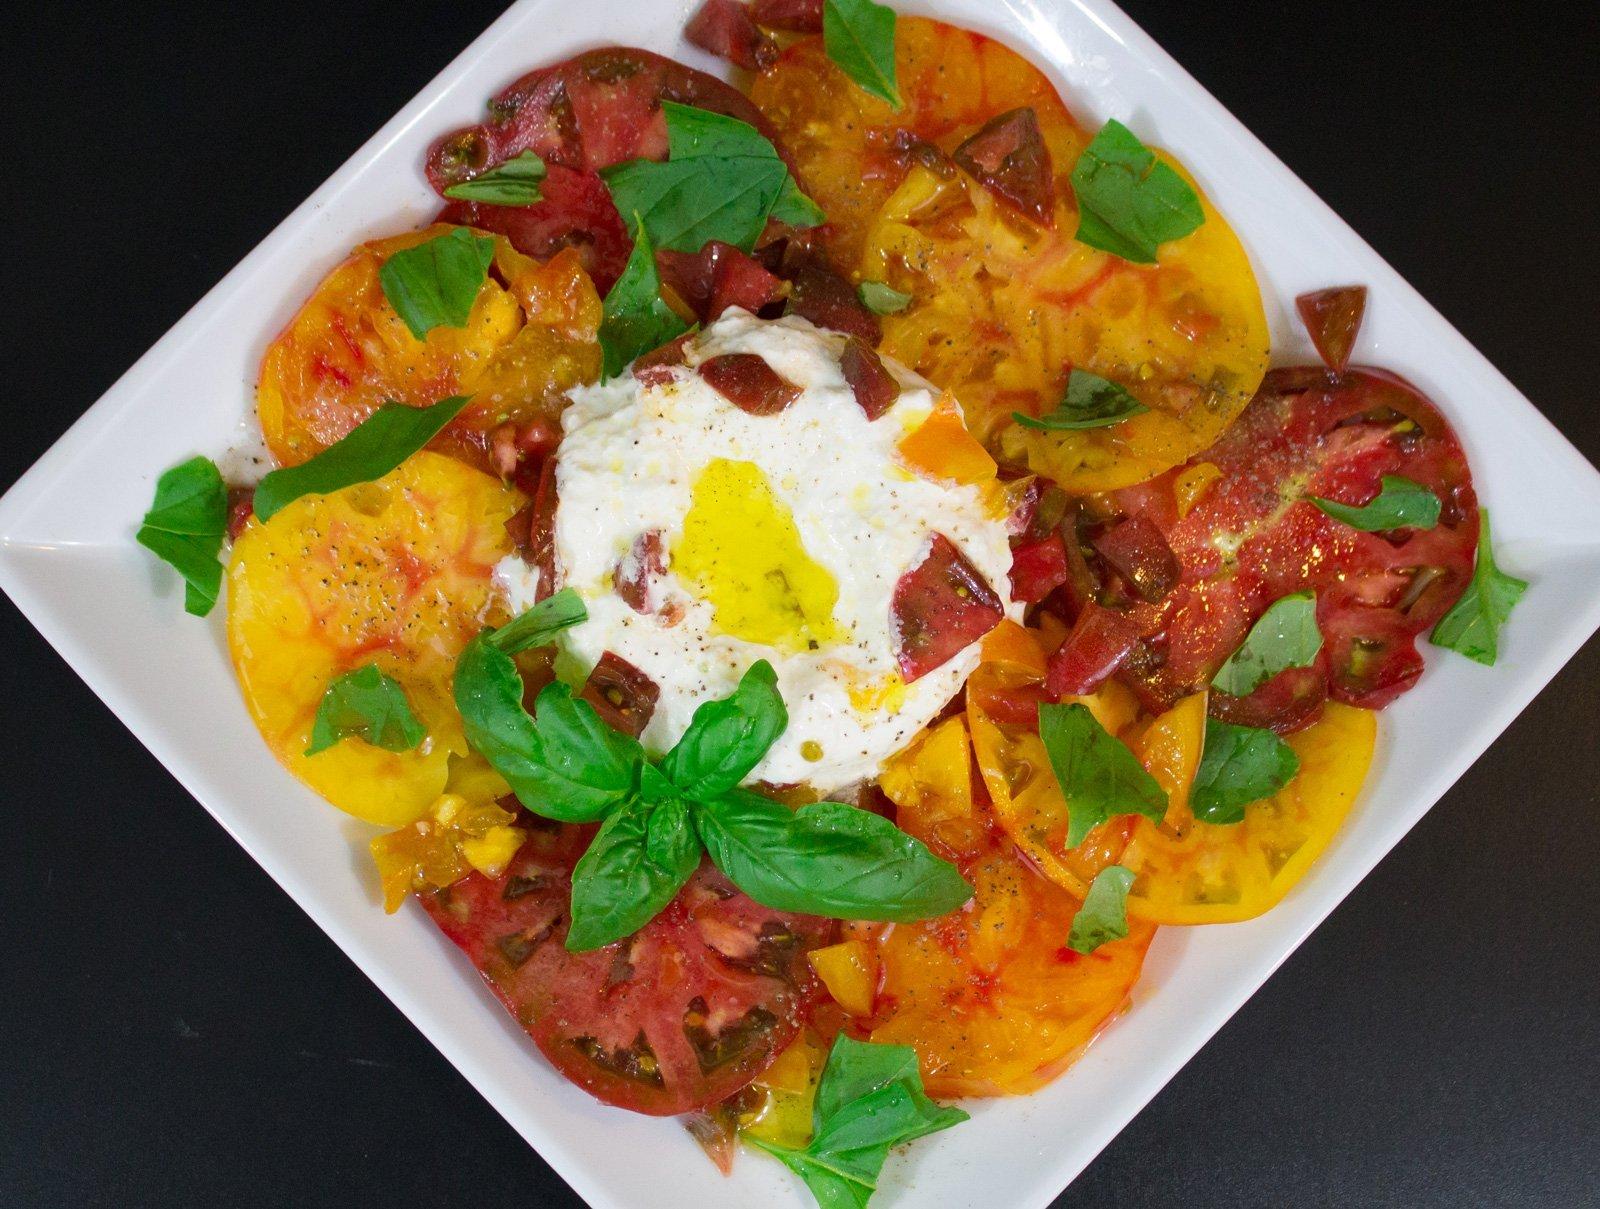 Heirloom Tomato and Burrata Appetizer